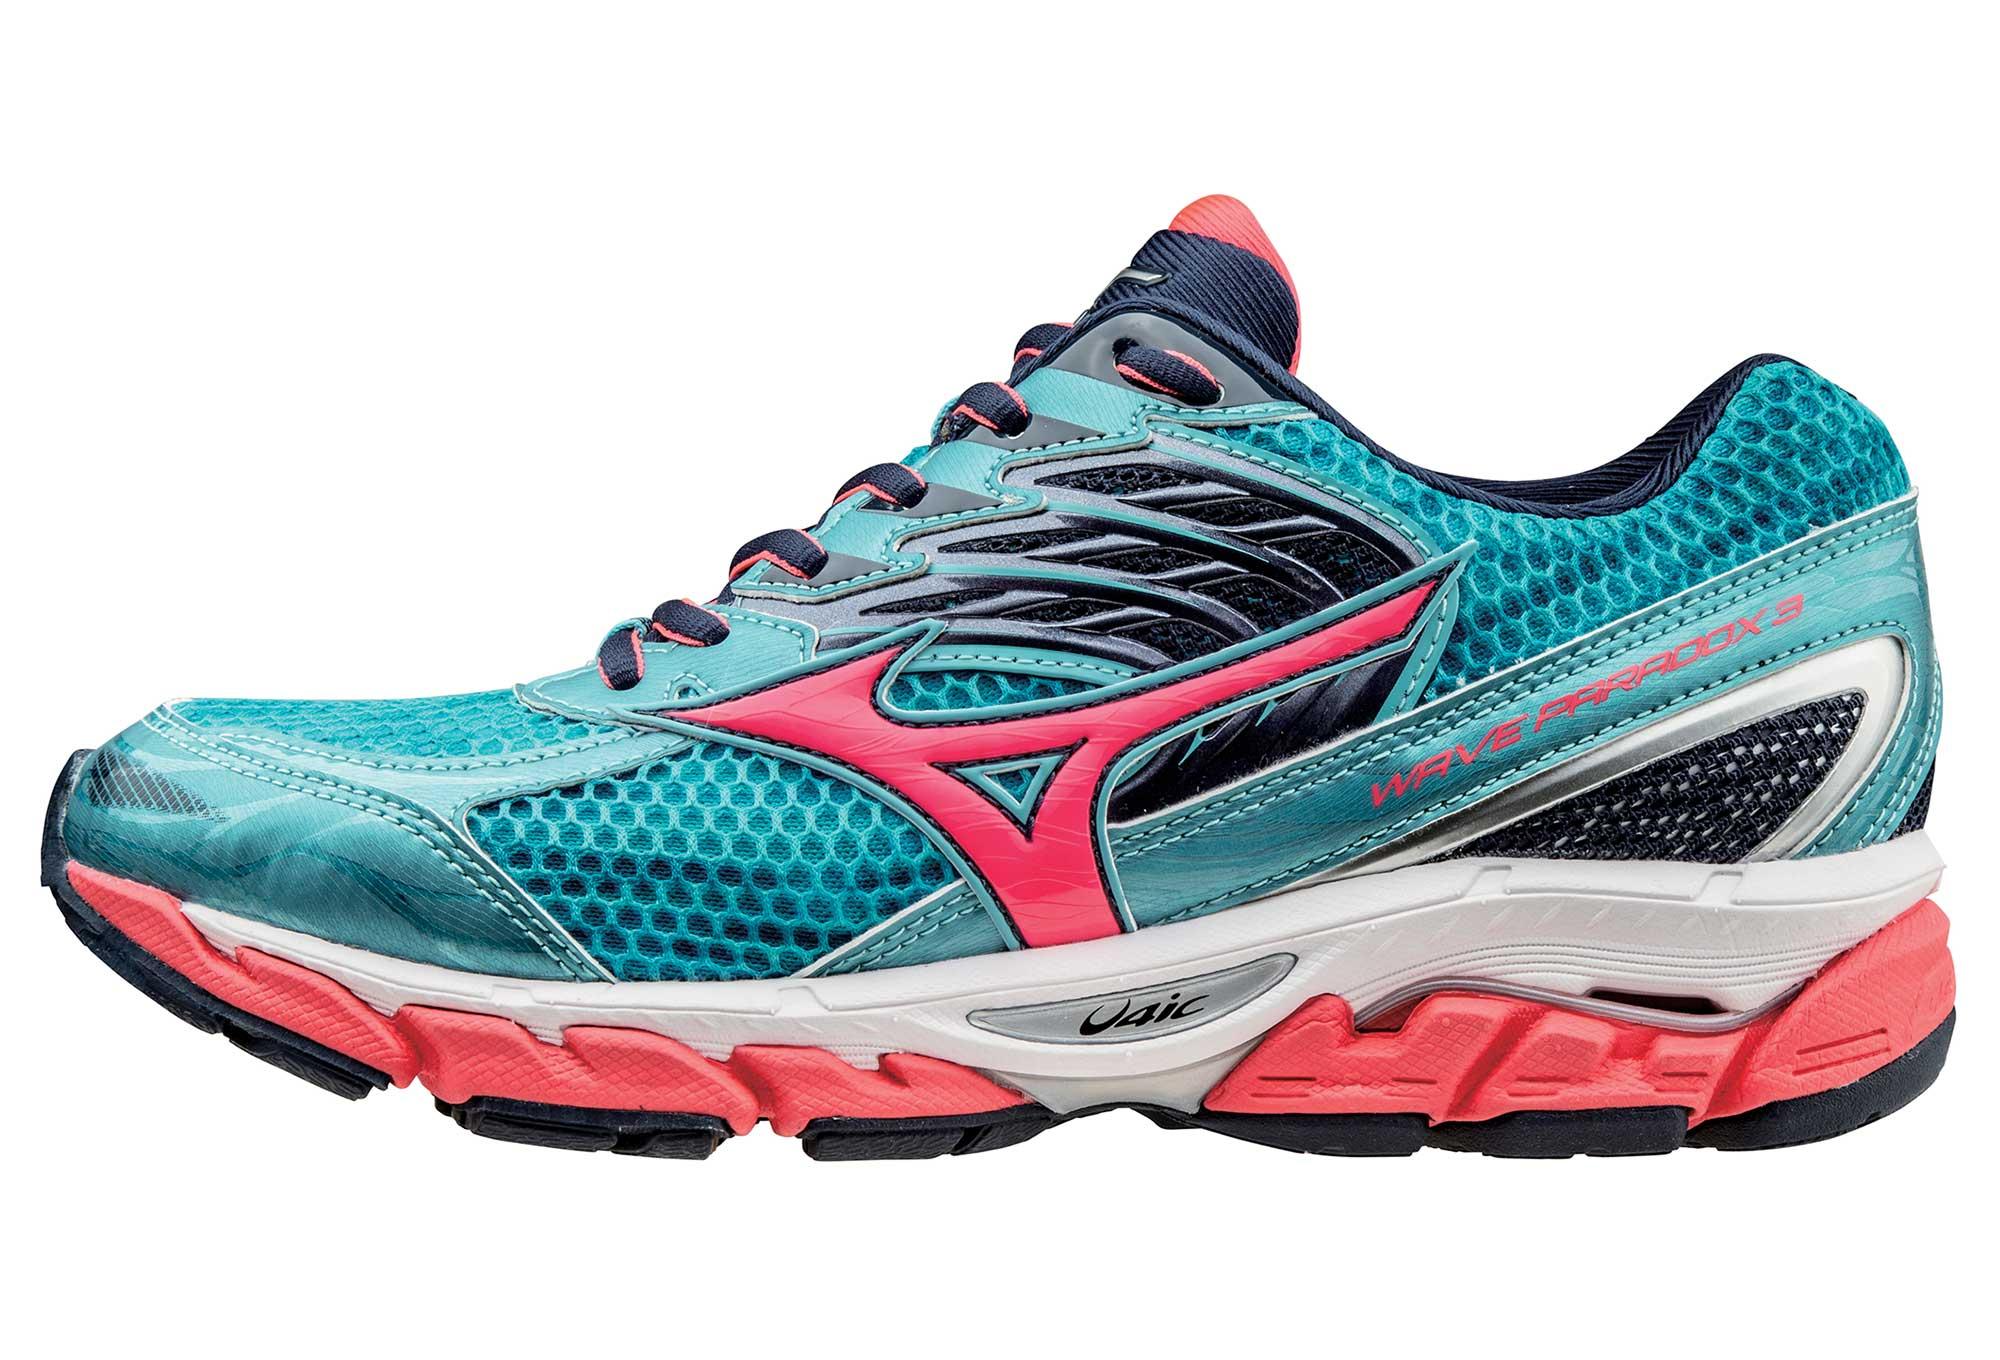 De Bleu Paradox 3 Femme Mizuno Wave Running Chaussures Fxd0ngpn